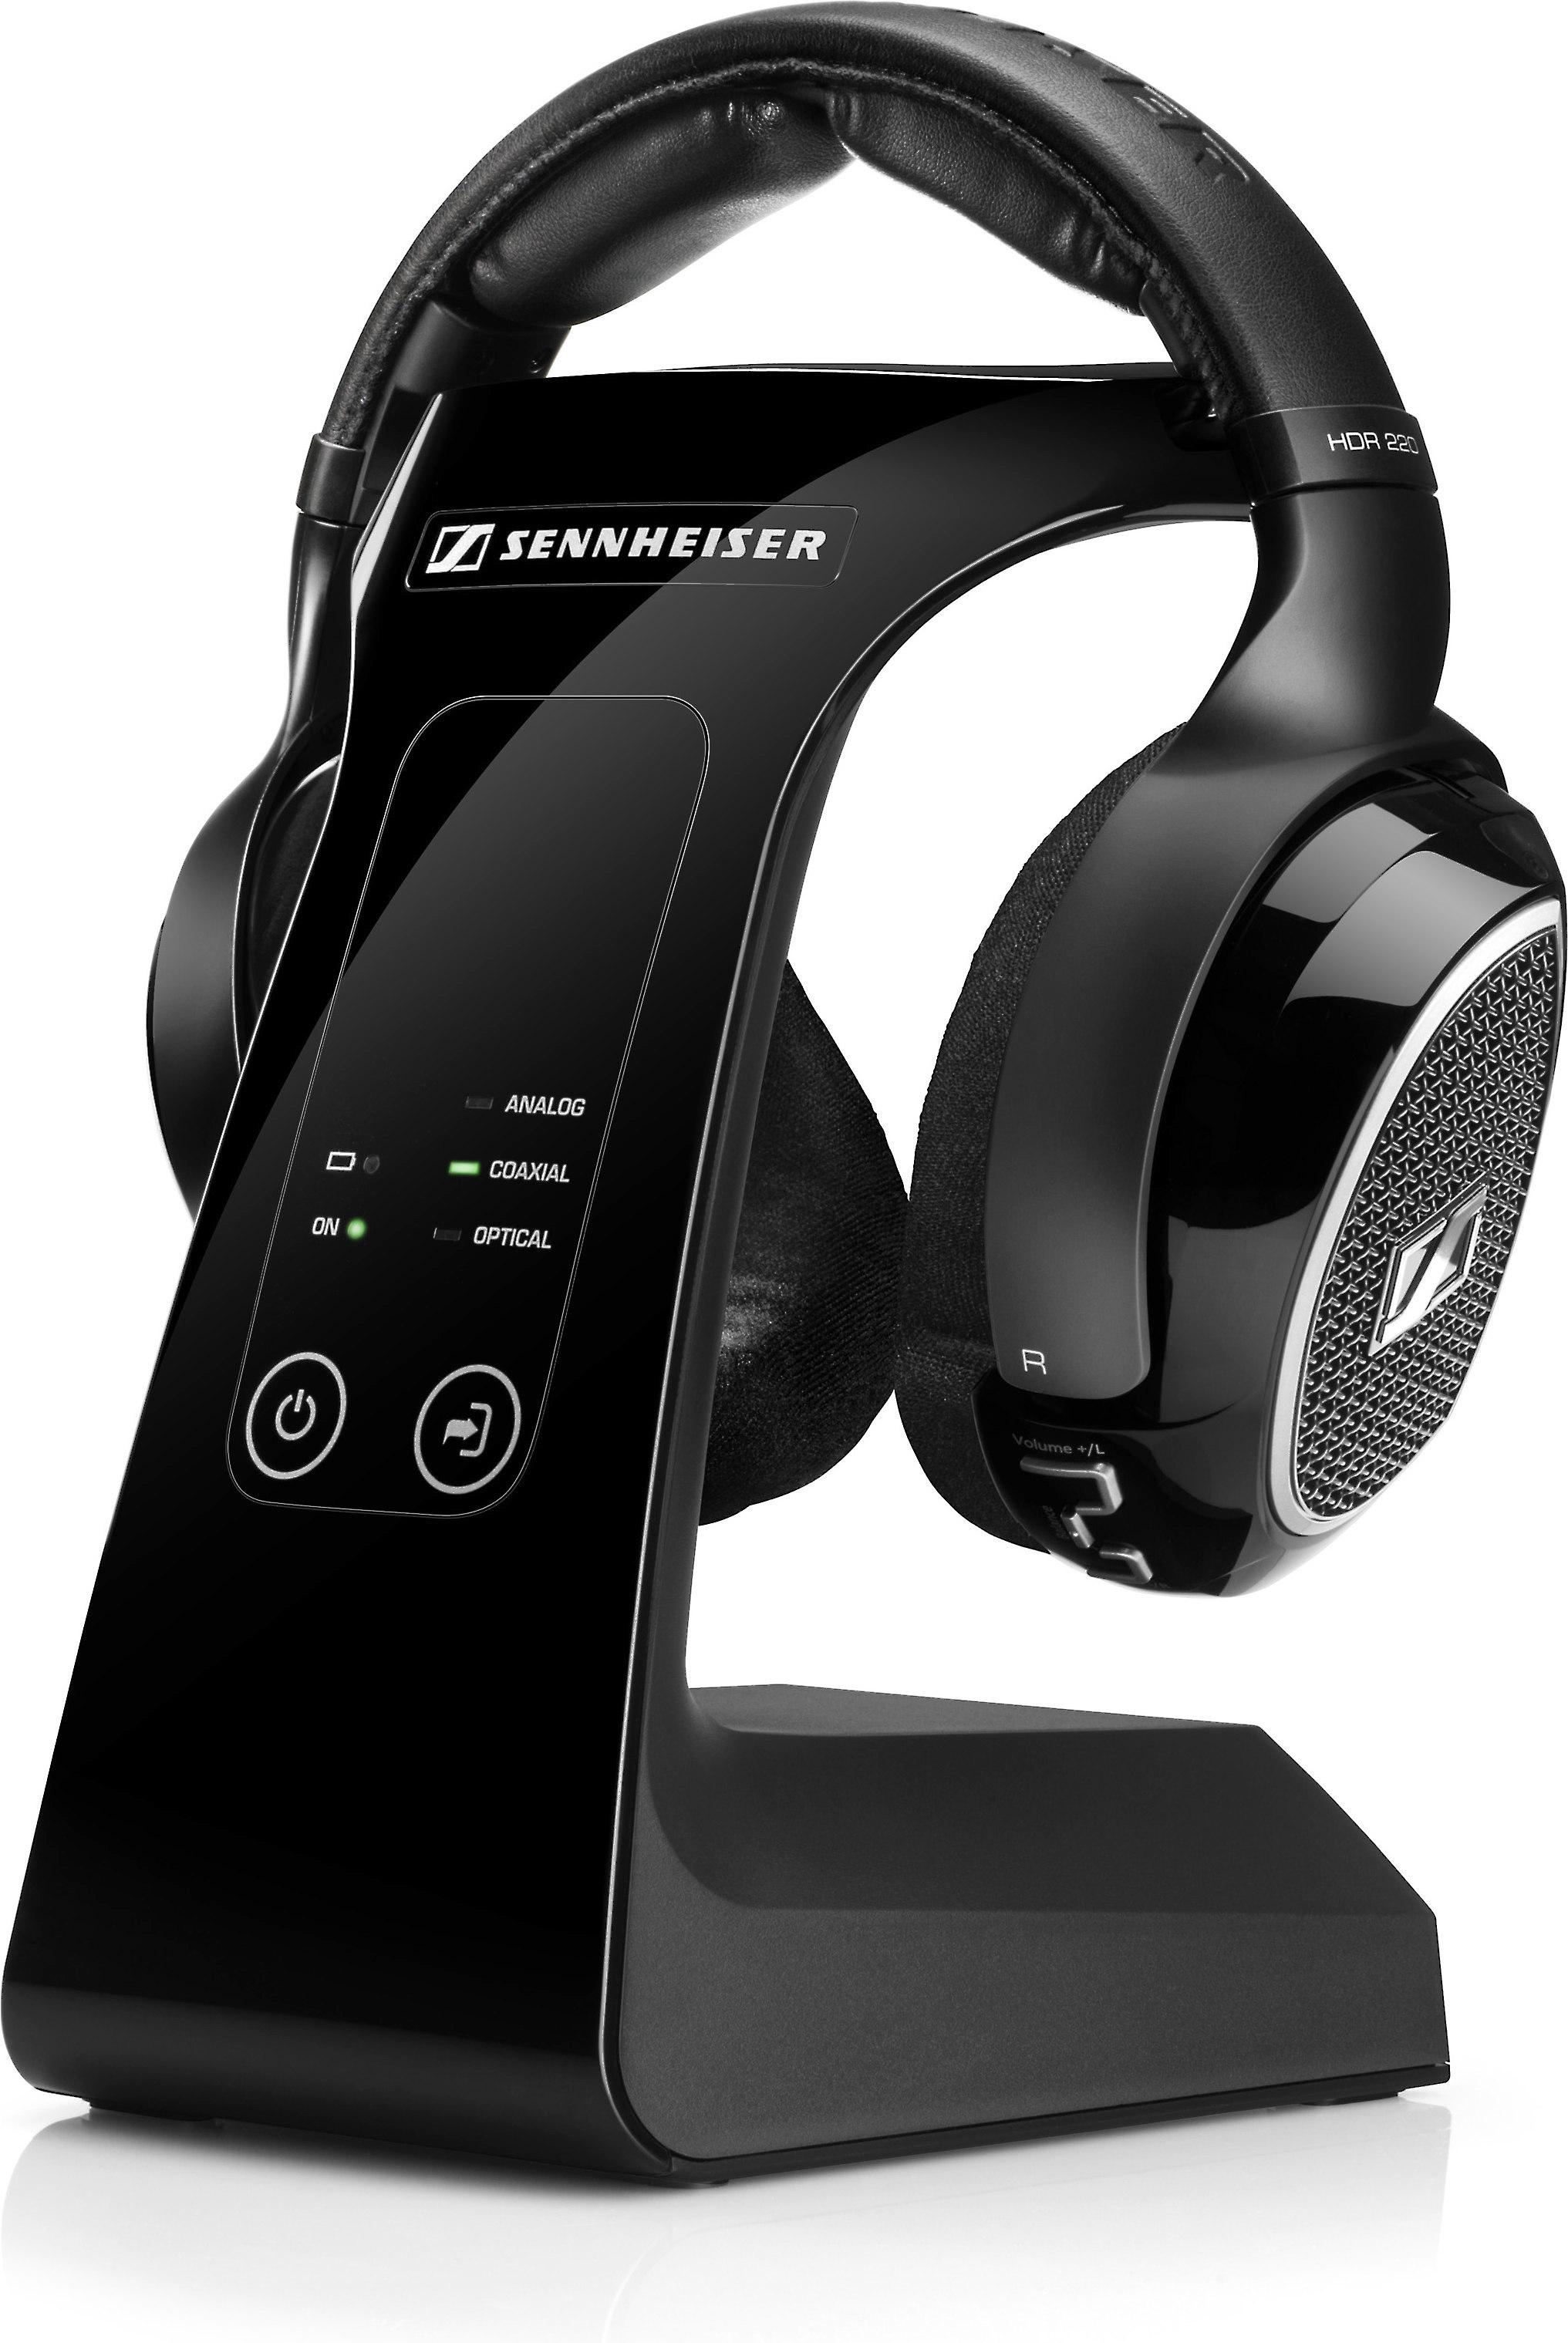 84748ecdf66 Sennheiser RS 220 Wireless headphones with docking station at  Crutchfield.com